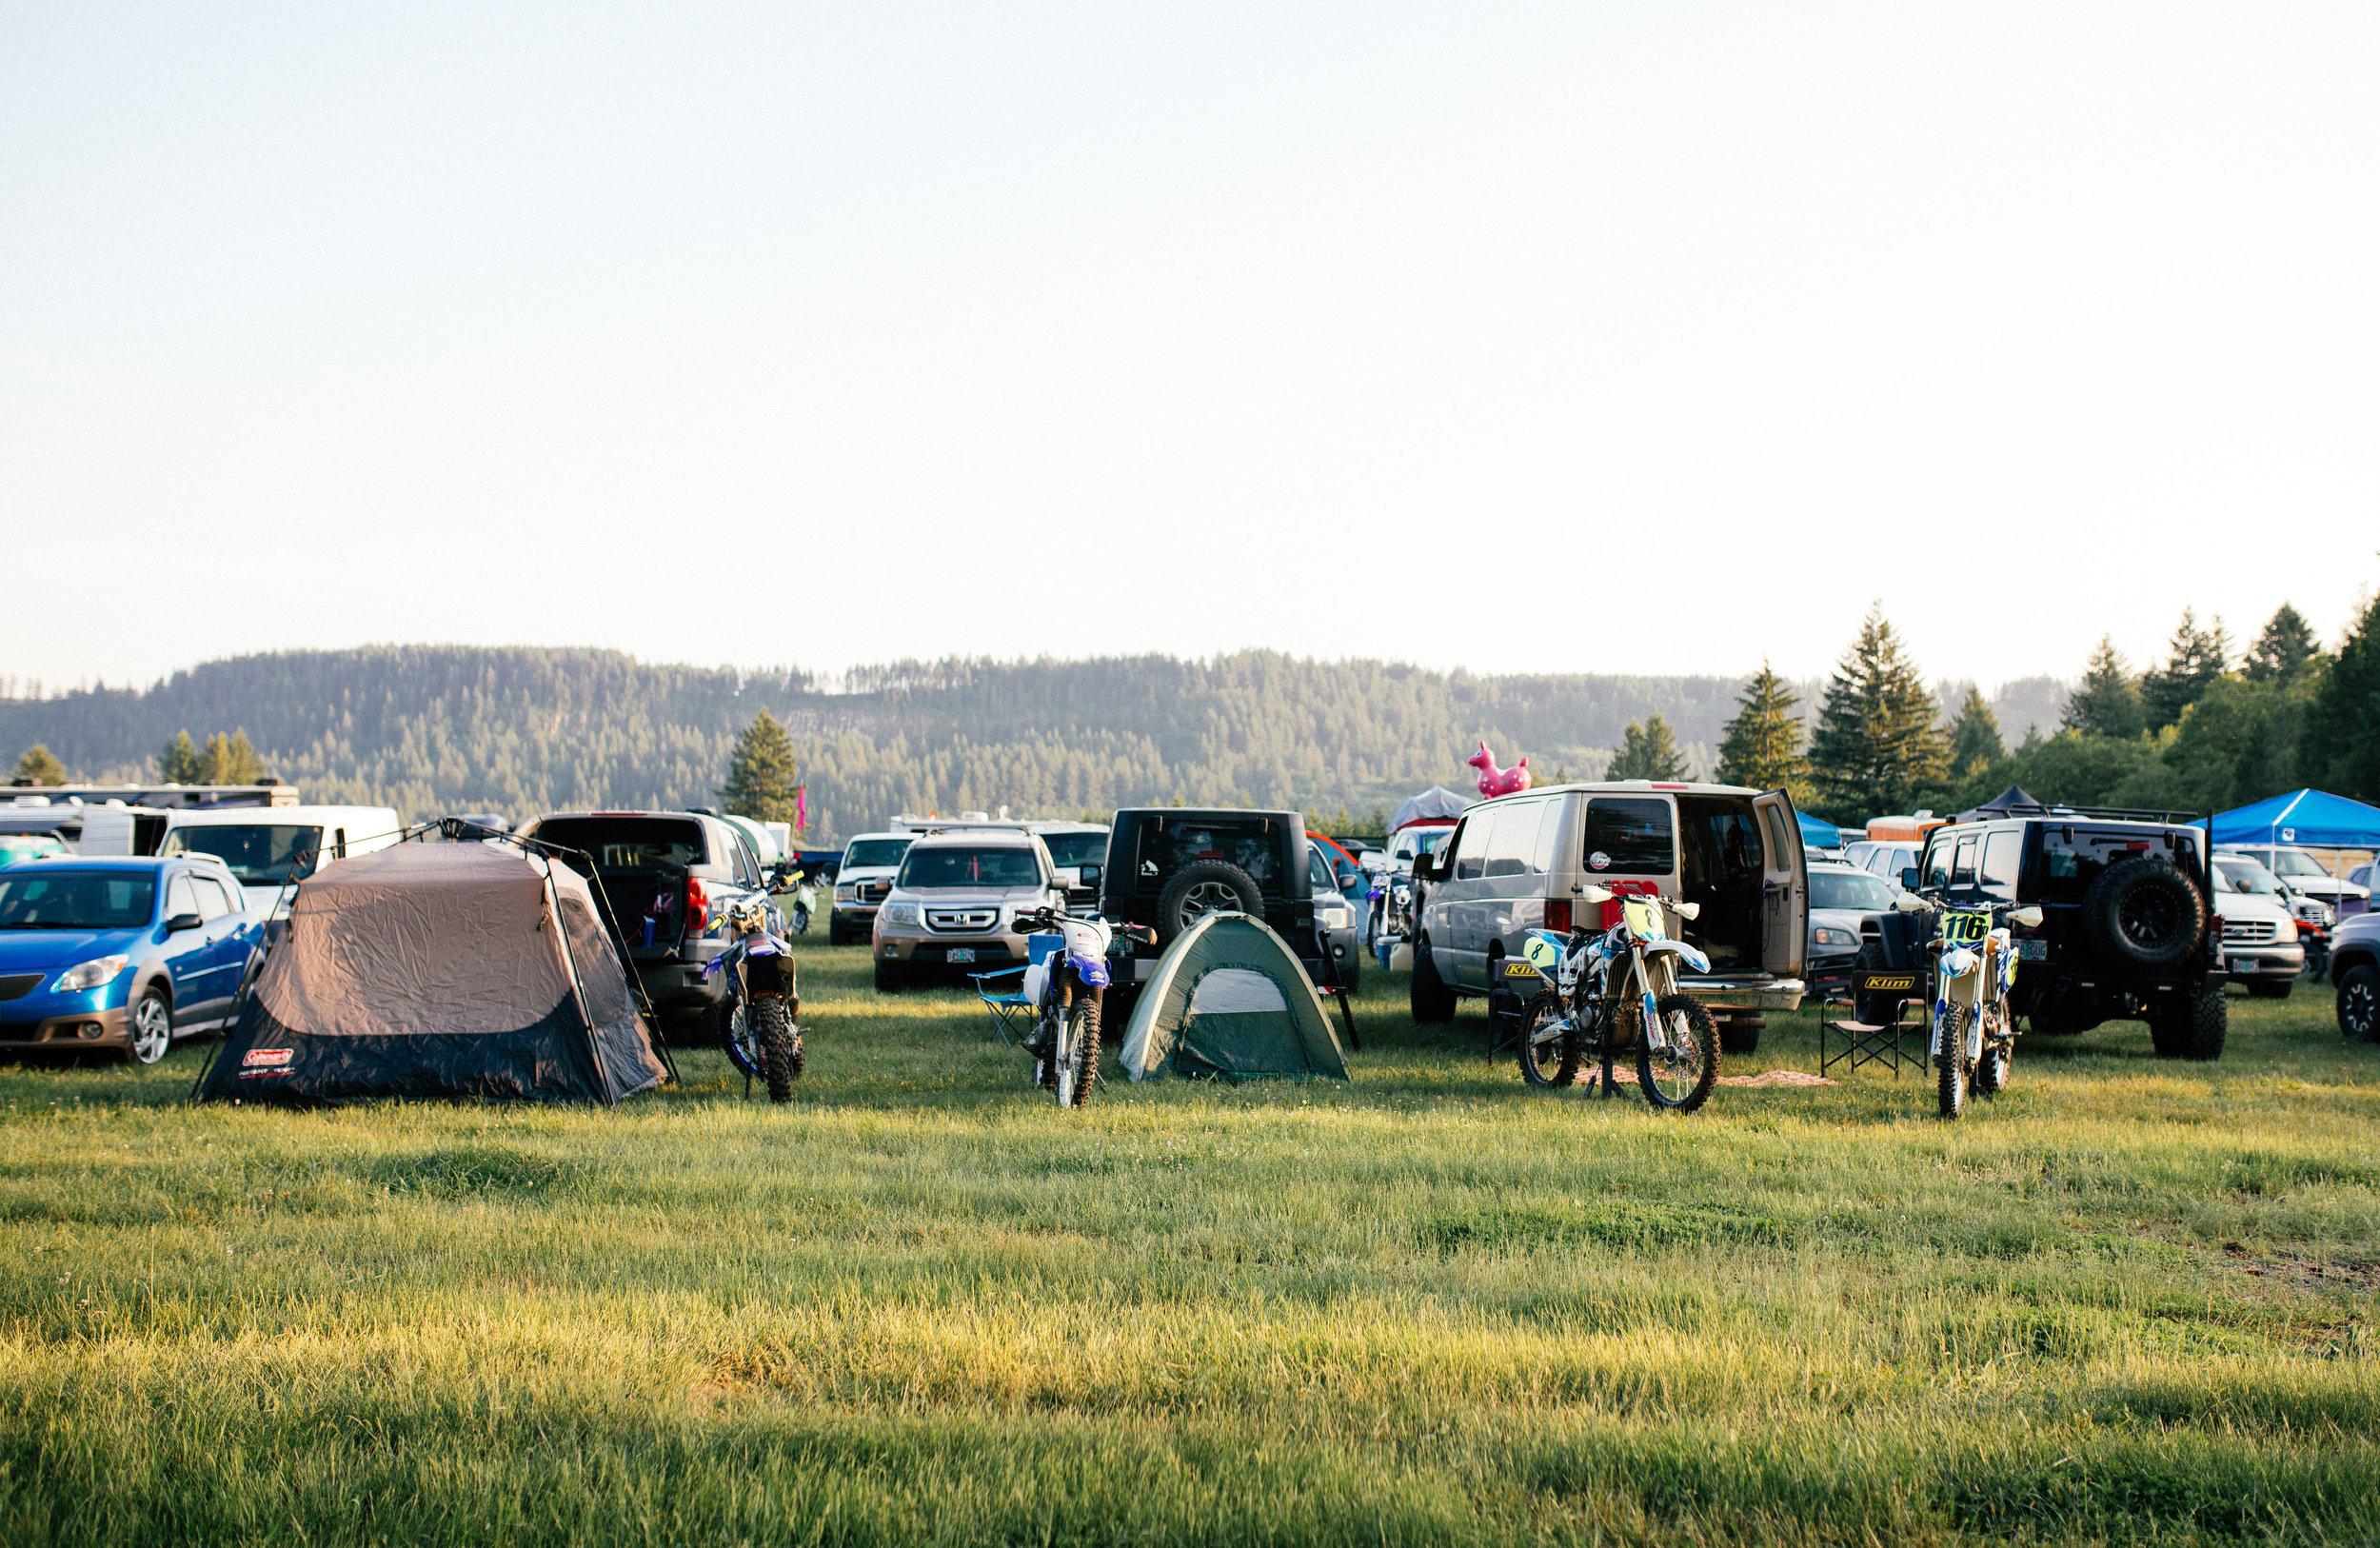 Camping at the beautiful Washougal MX Park